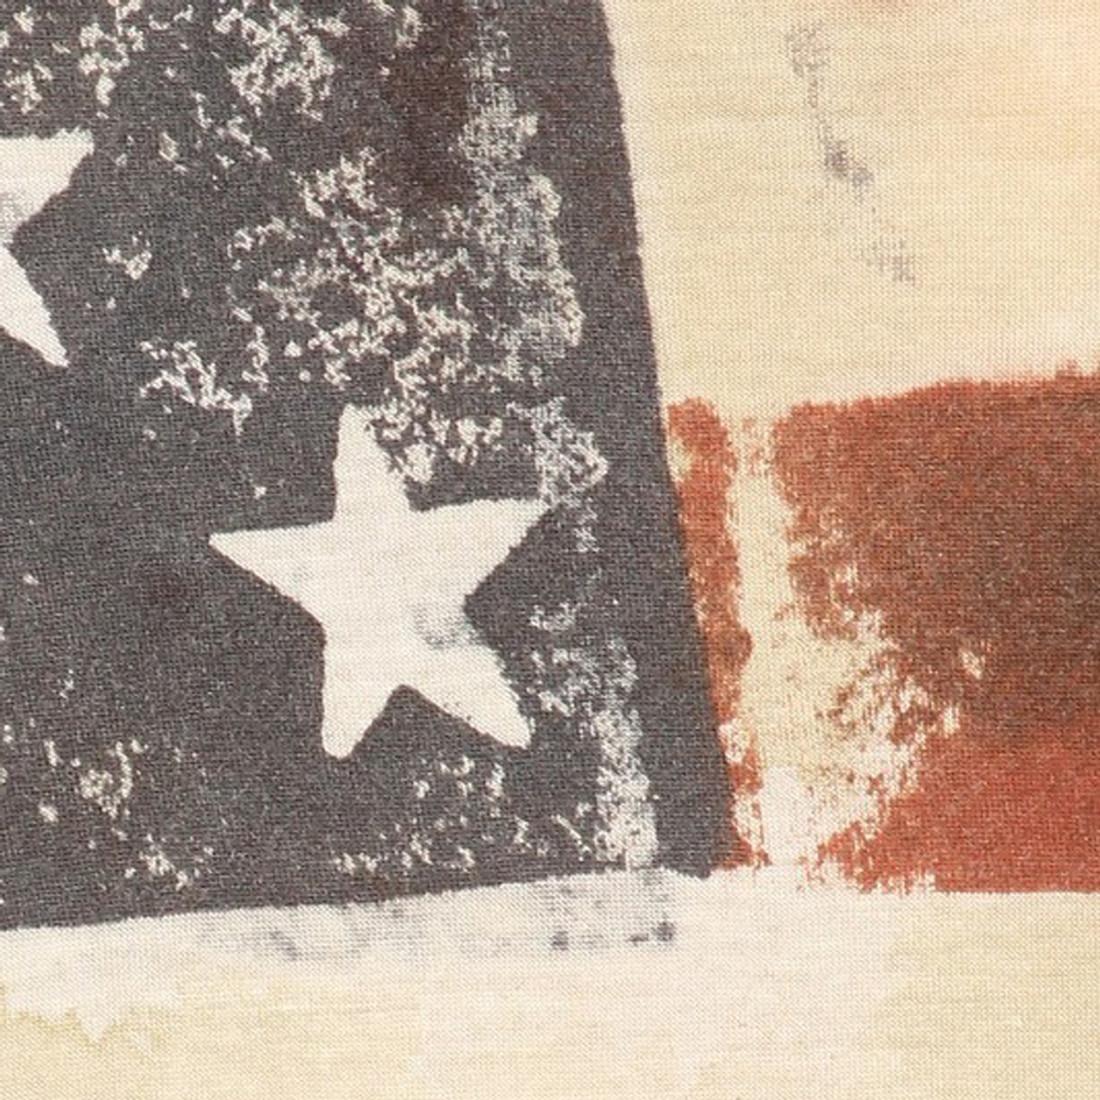 American Flag Tank Top fabric close up